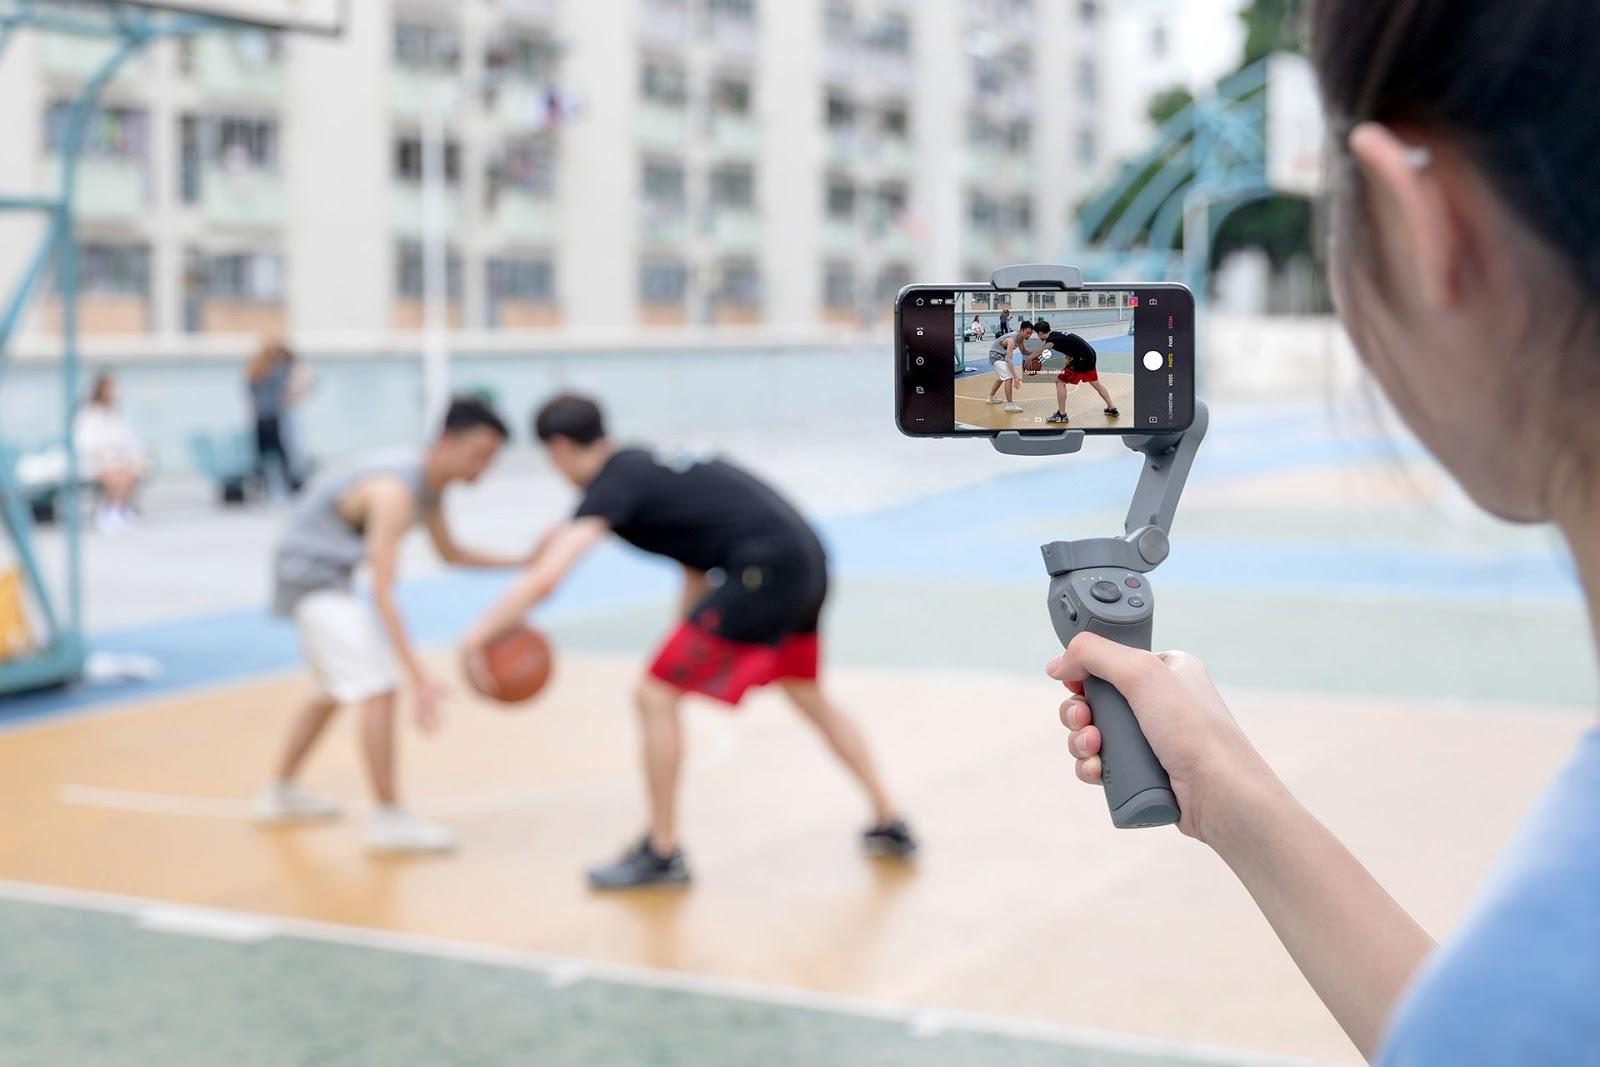 Использование DJI Osmo Mobile 3 для съемки со смартфоном